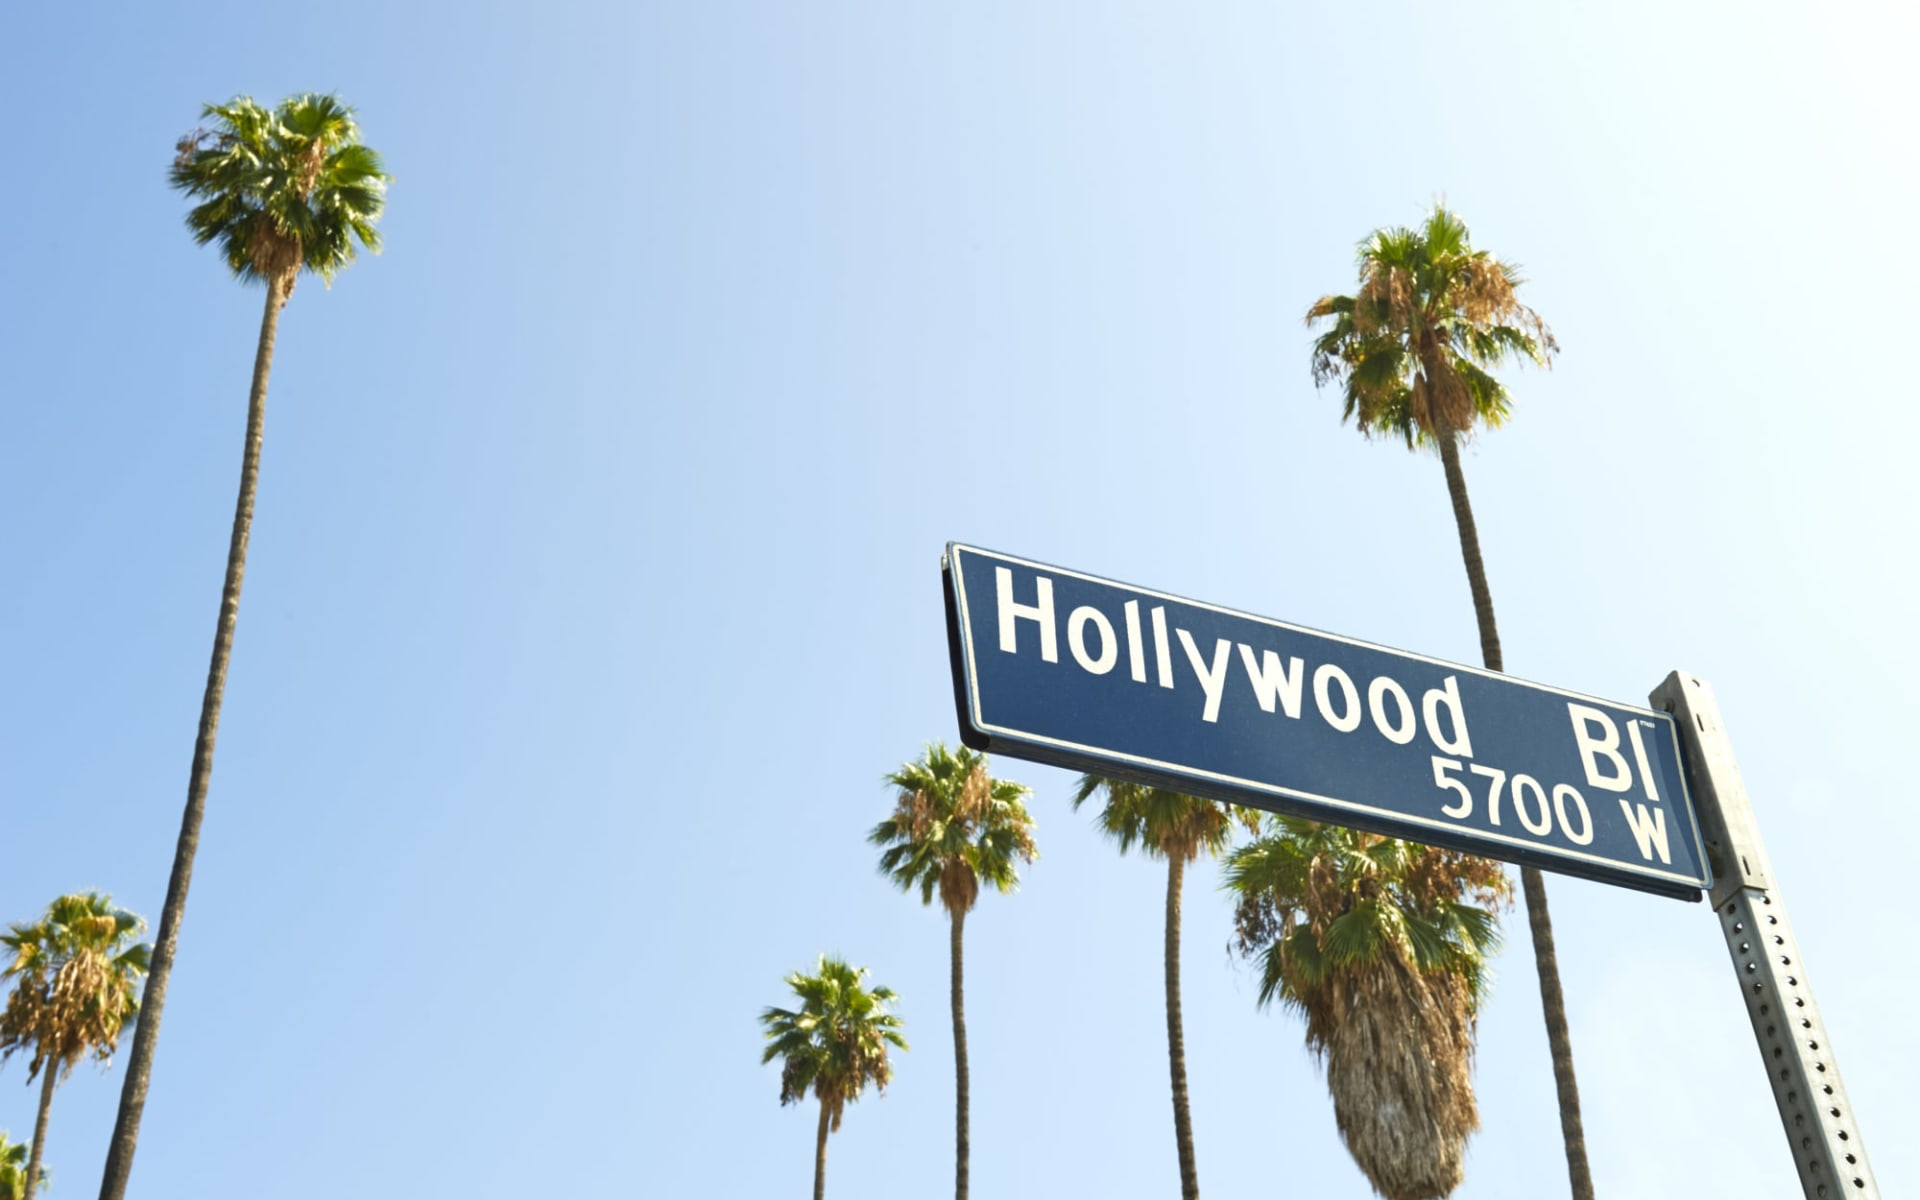 Entdecker-Reise Südwesten ab San Francisco: USA_California_Los Angeles_Hollywood